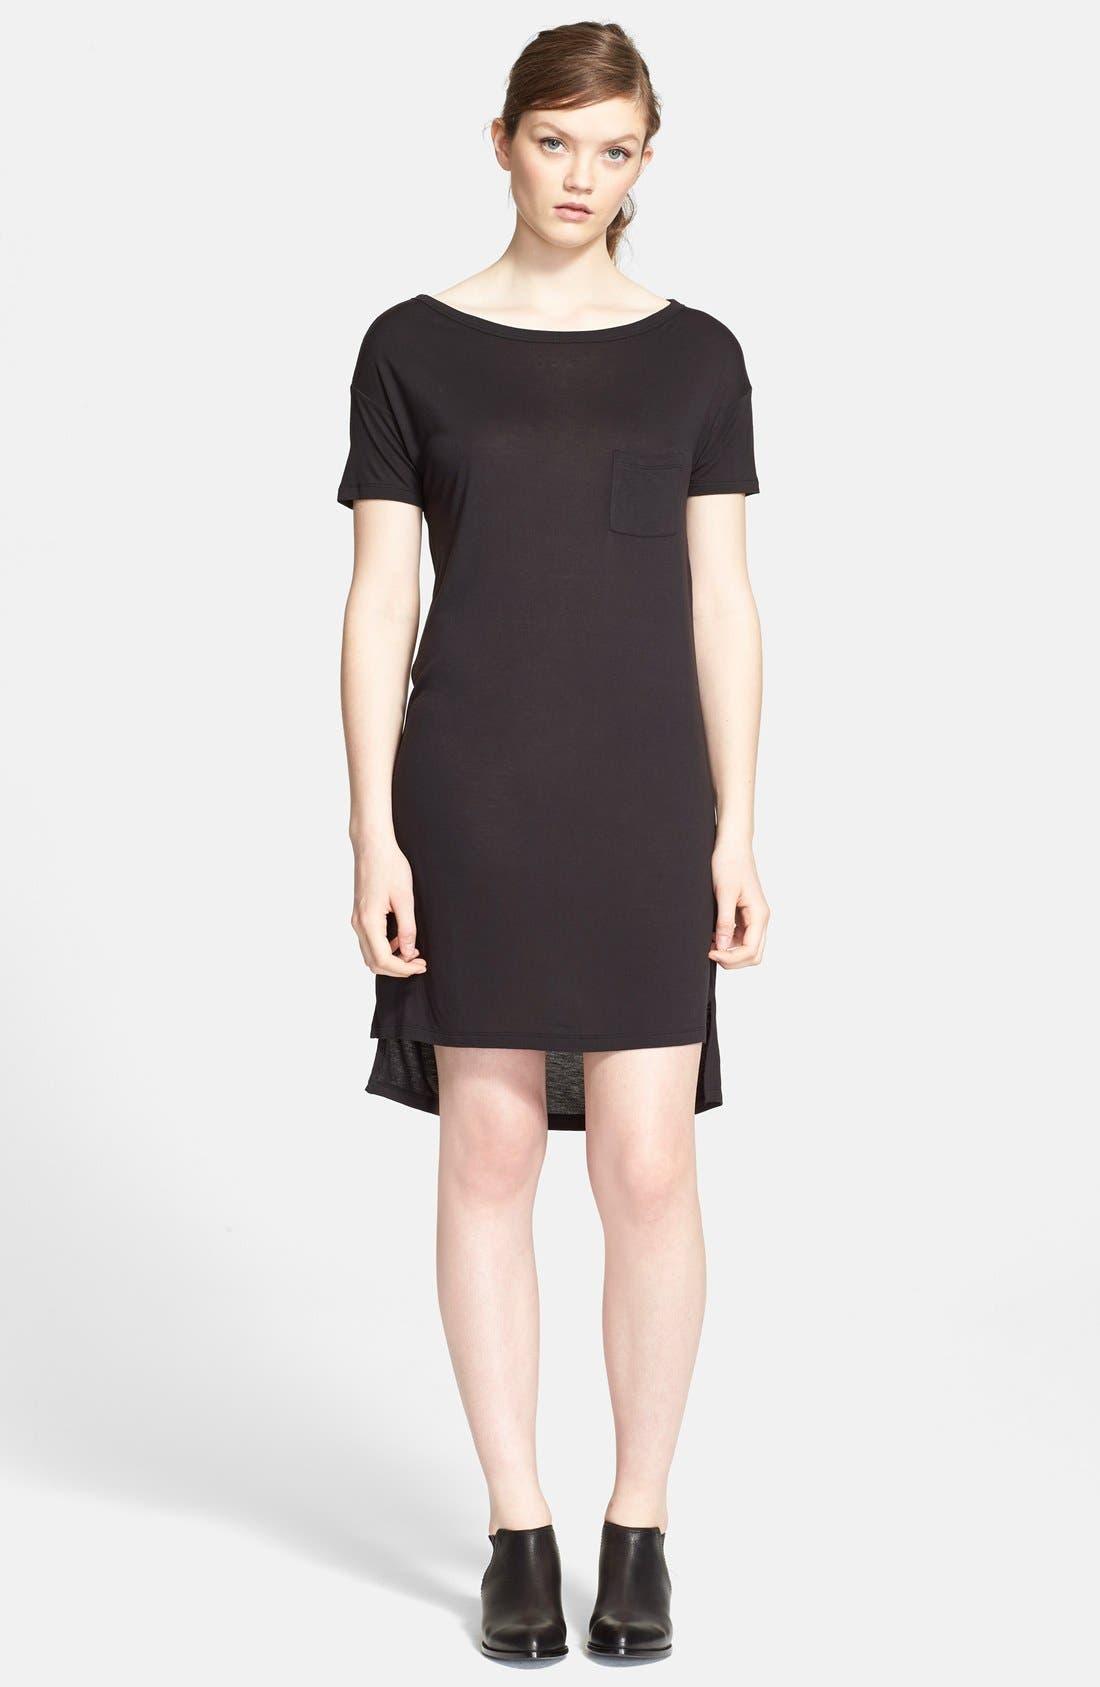 T by Alexander Wang Jersey Dress,                         Main,                         color, 001